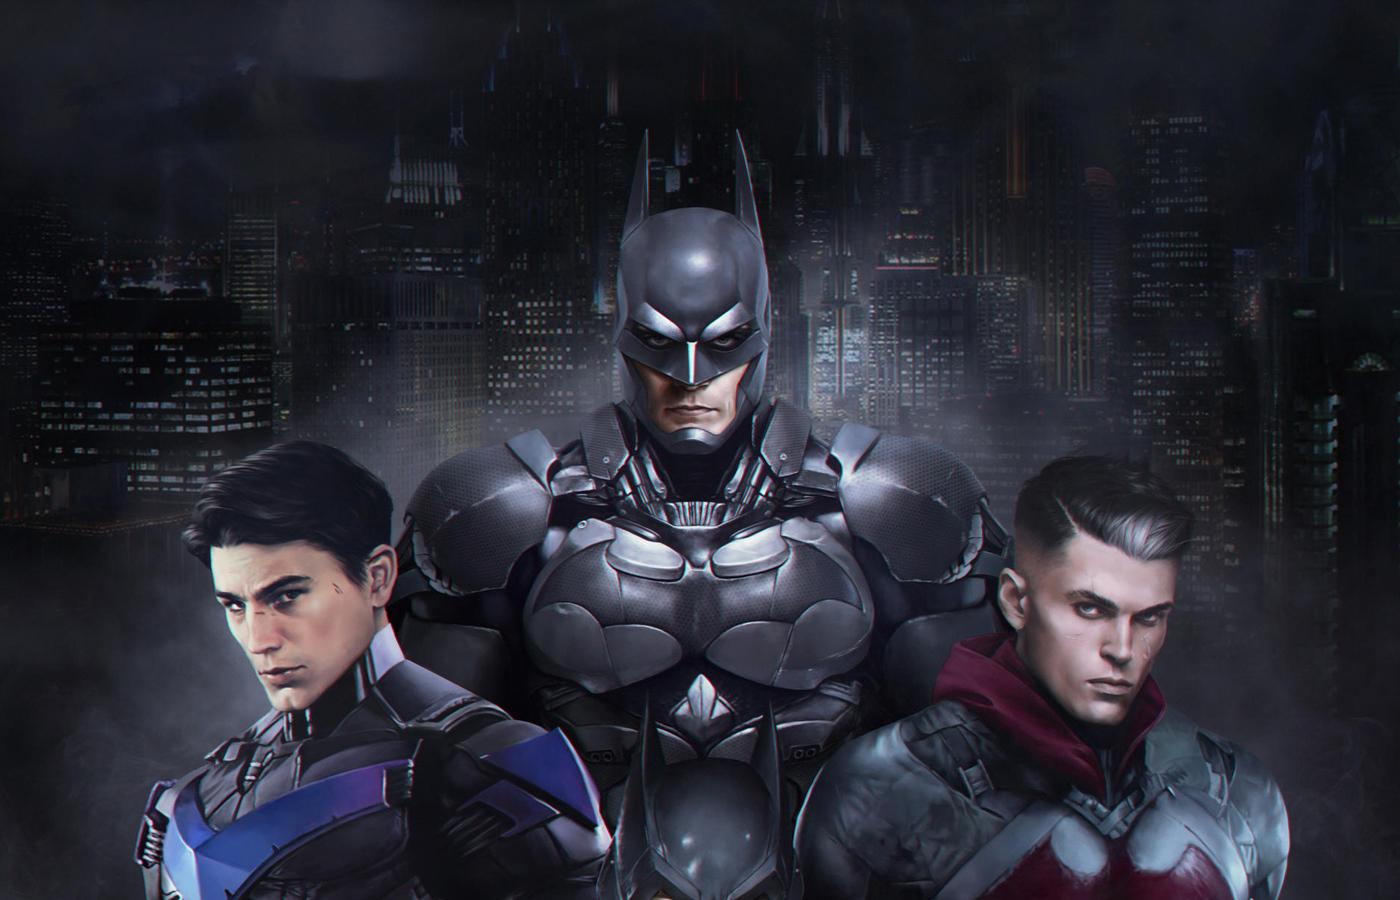 gothams-bat-family-ll.jpg